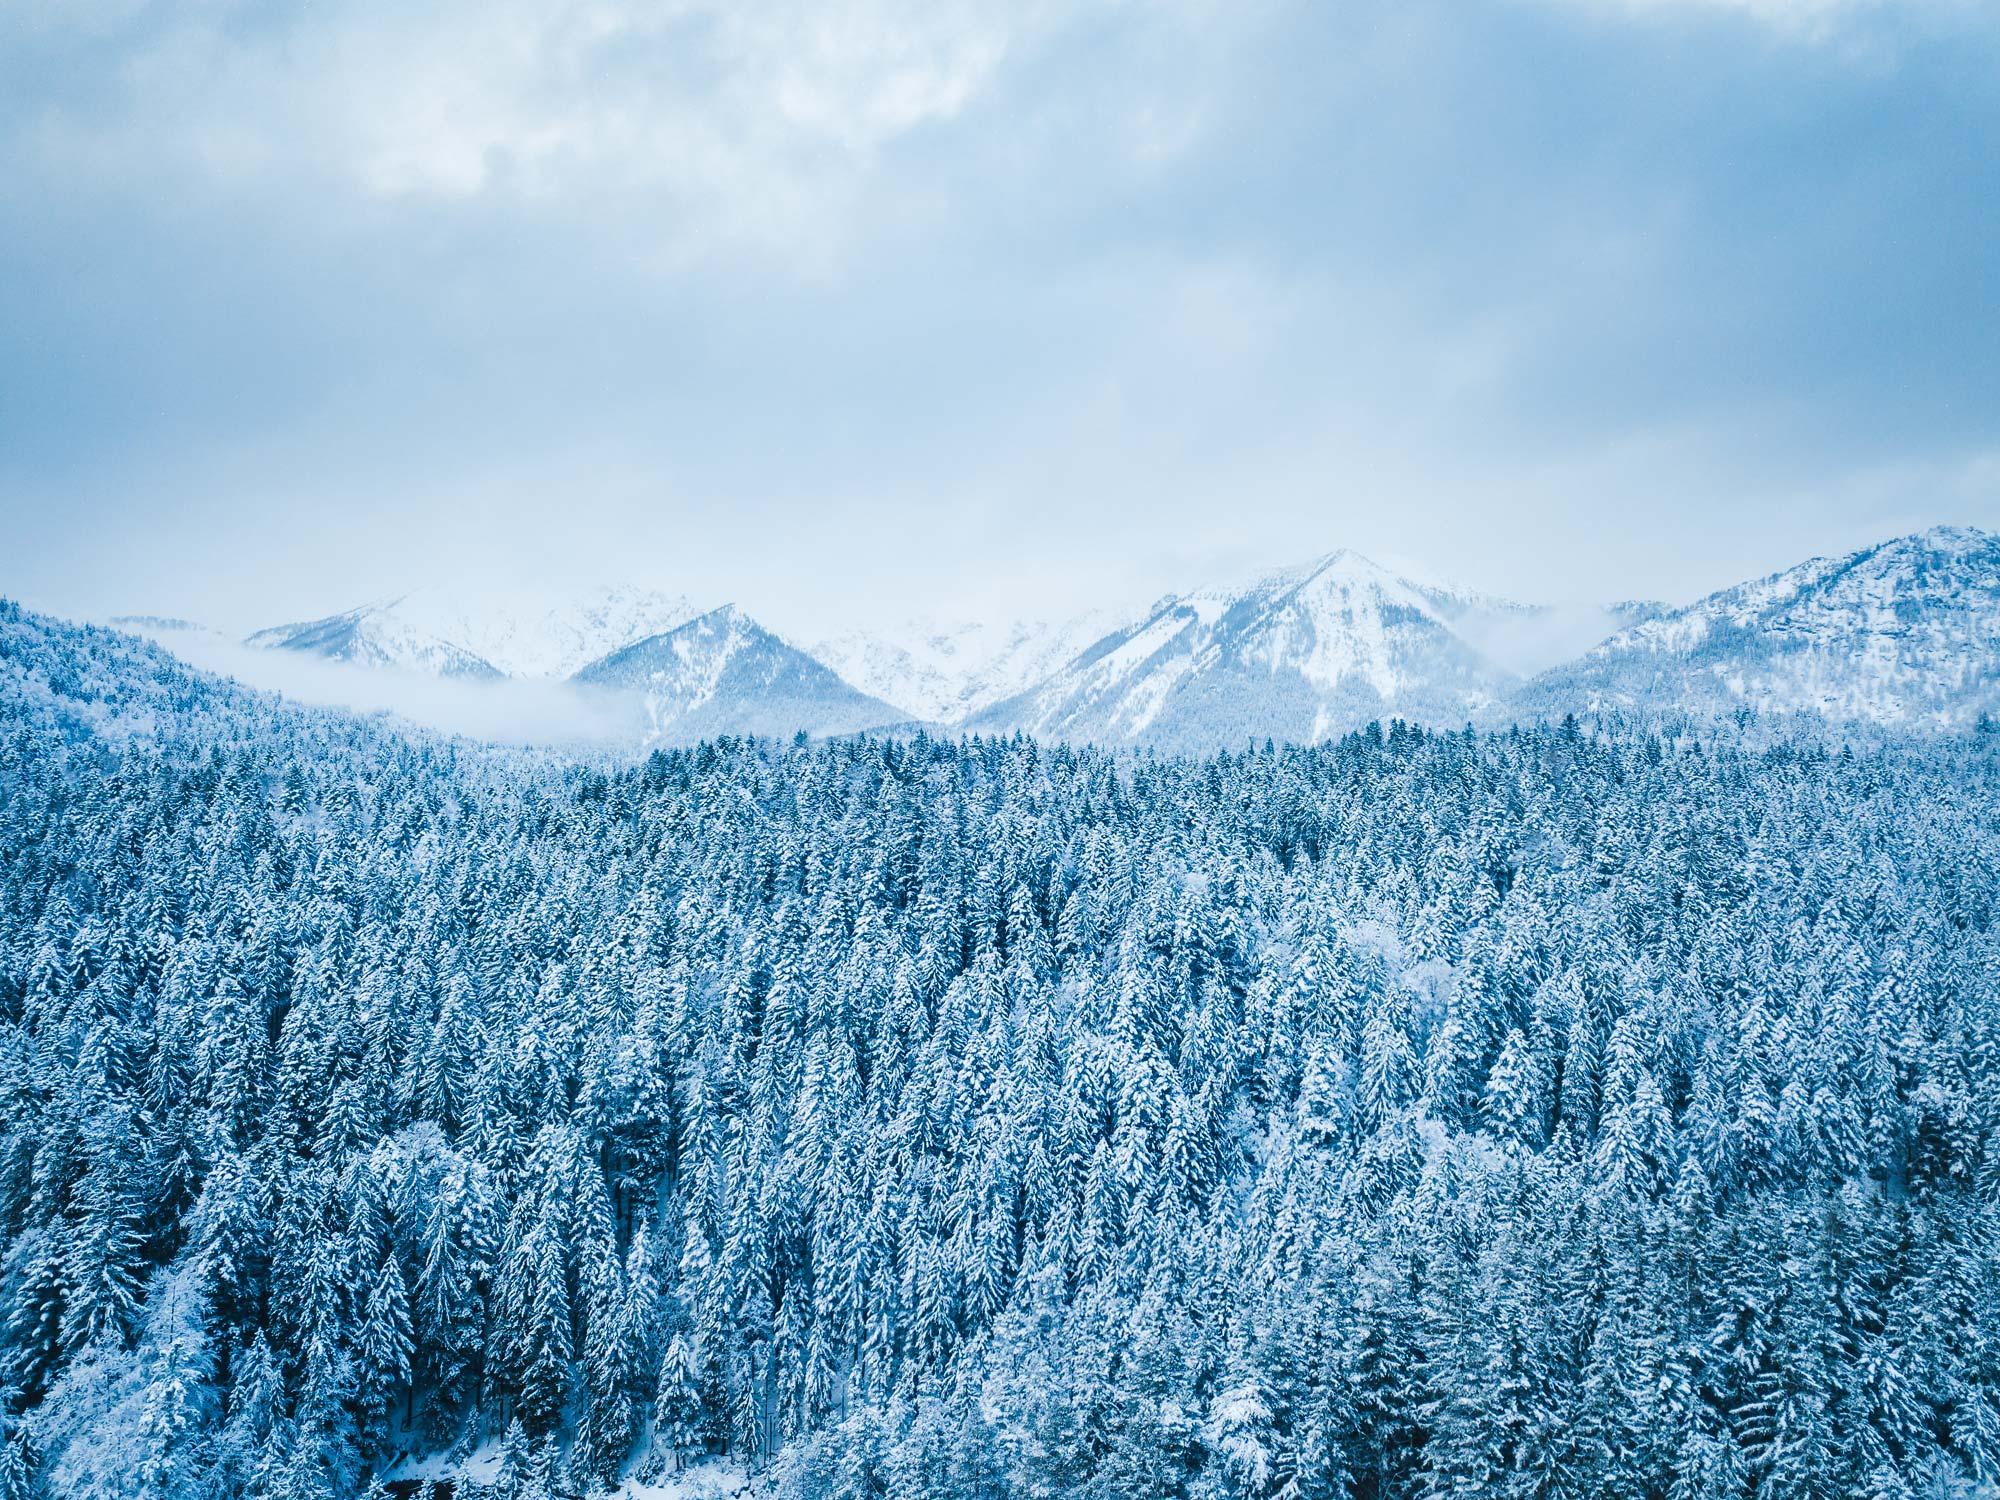 Tom_Schueler_Fotografie_Landschaft_Alpen_Dolomiten_3